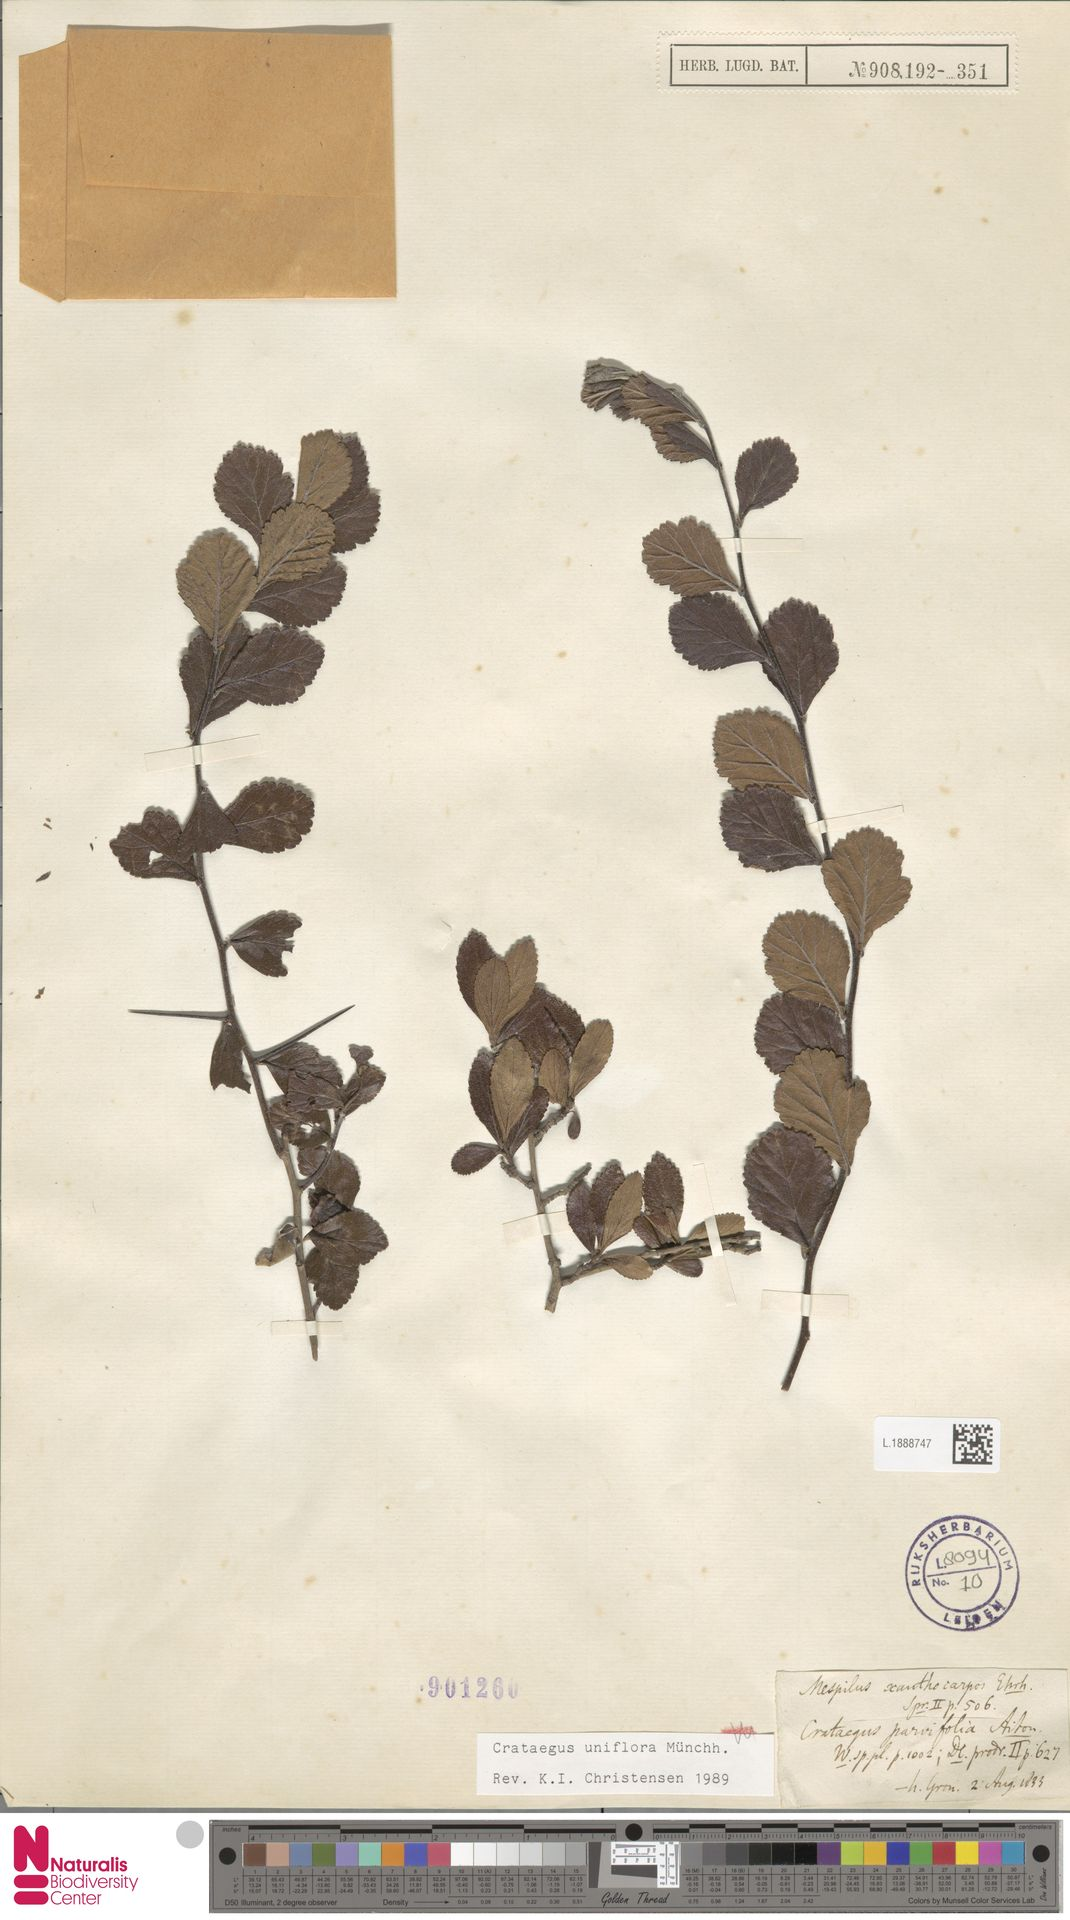 L.1888747   Crataegus uniflora Münchh.